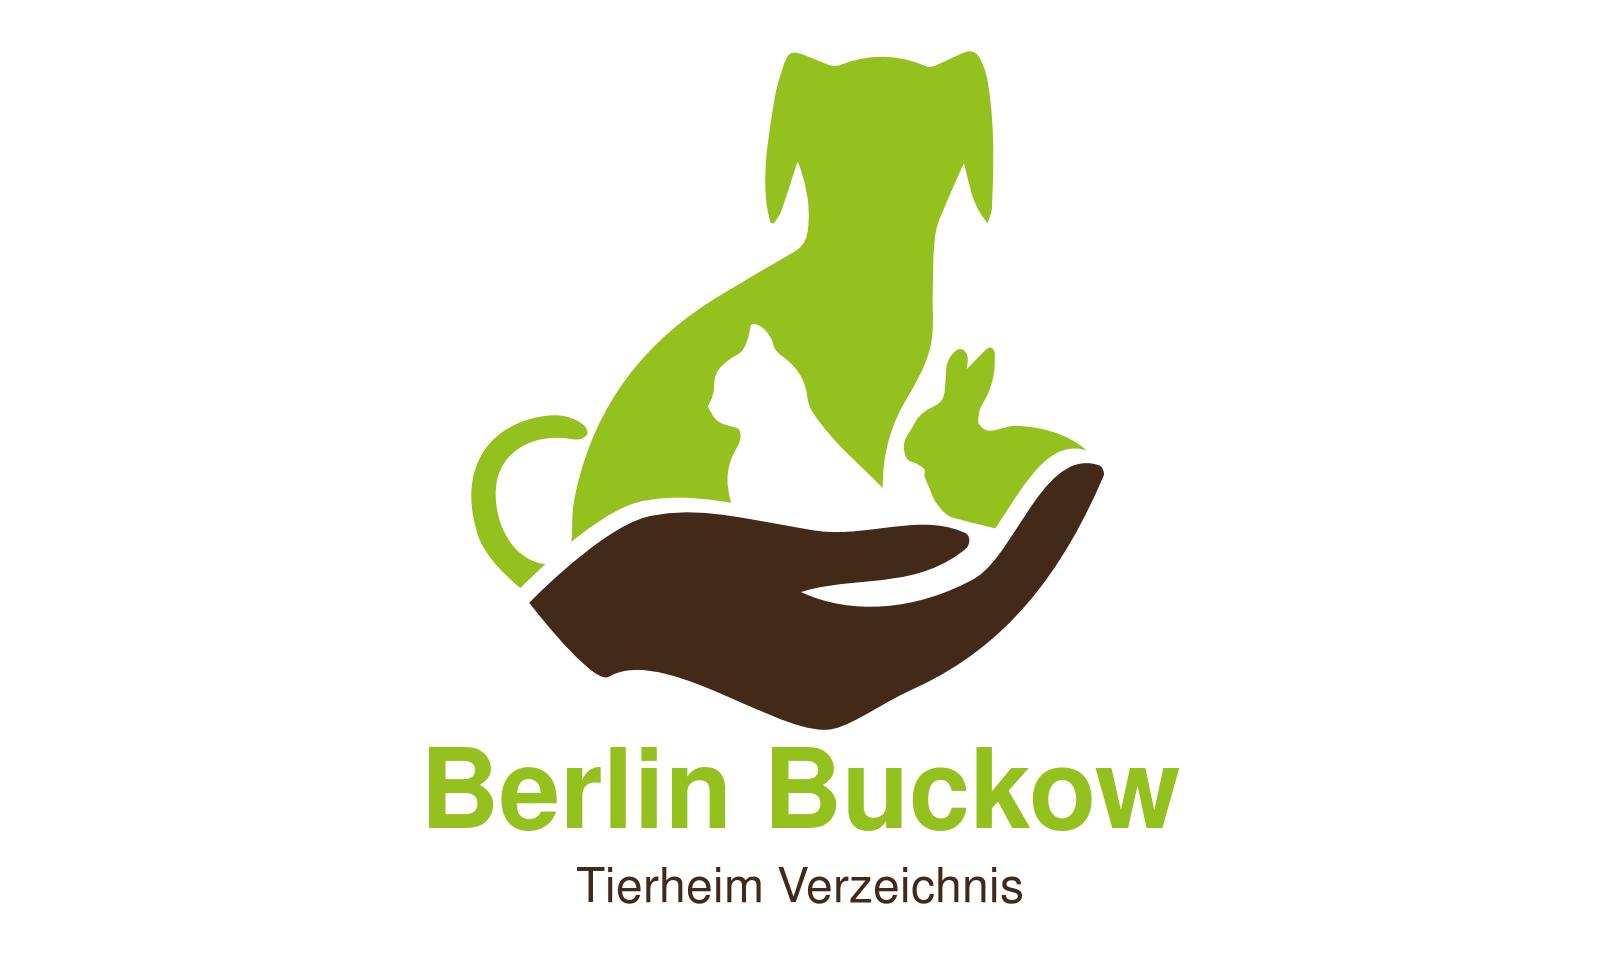 Tierheim Berlin Buckow